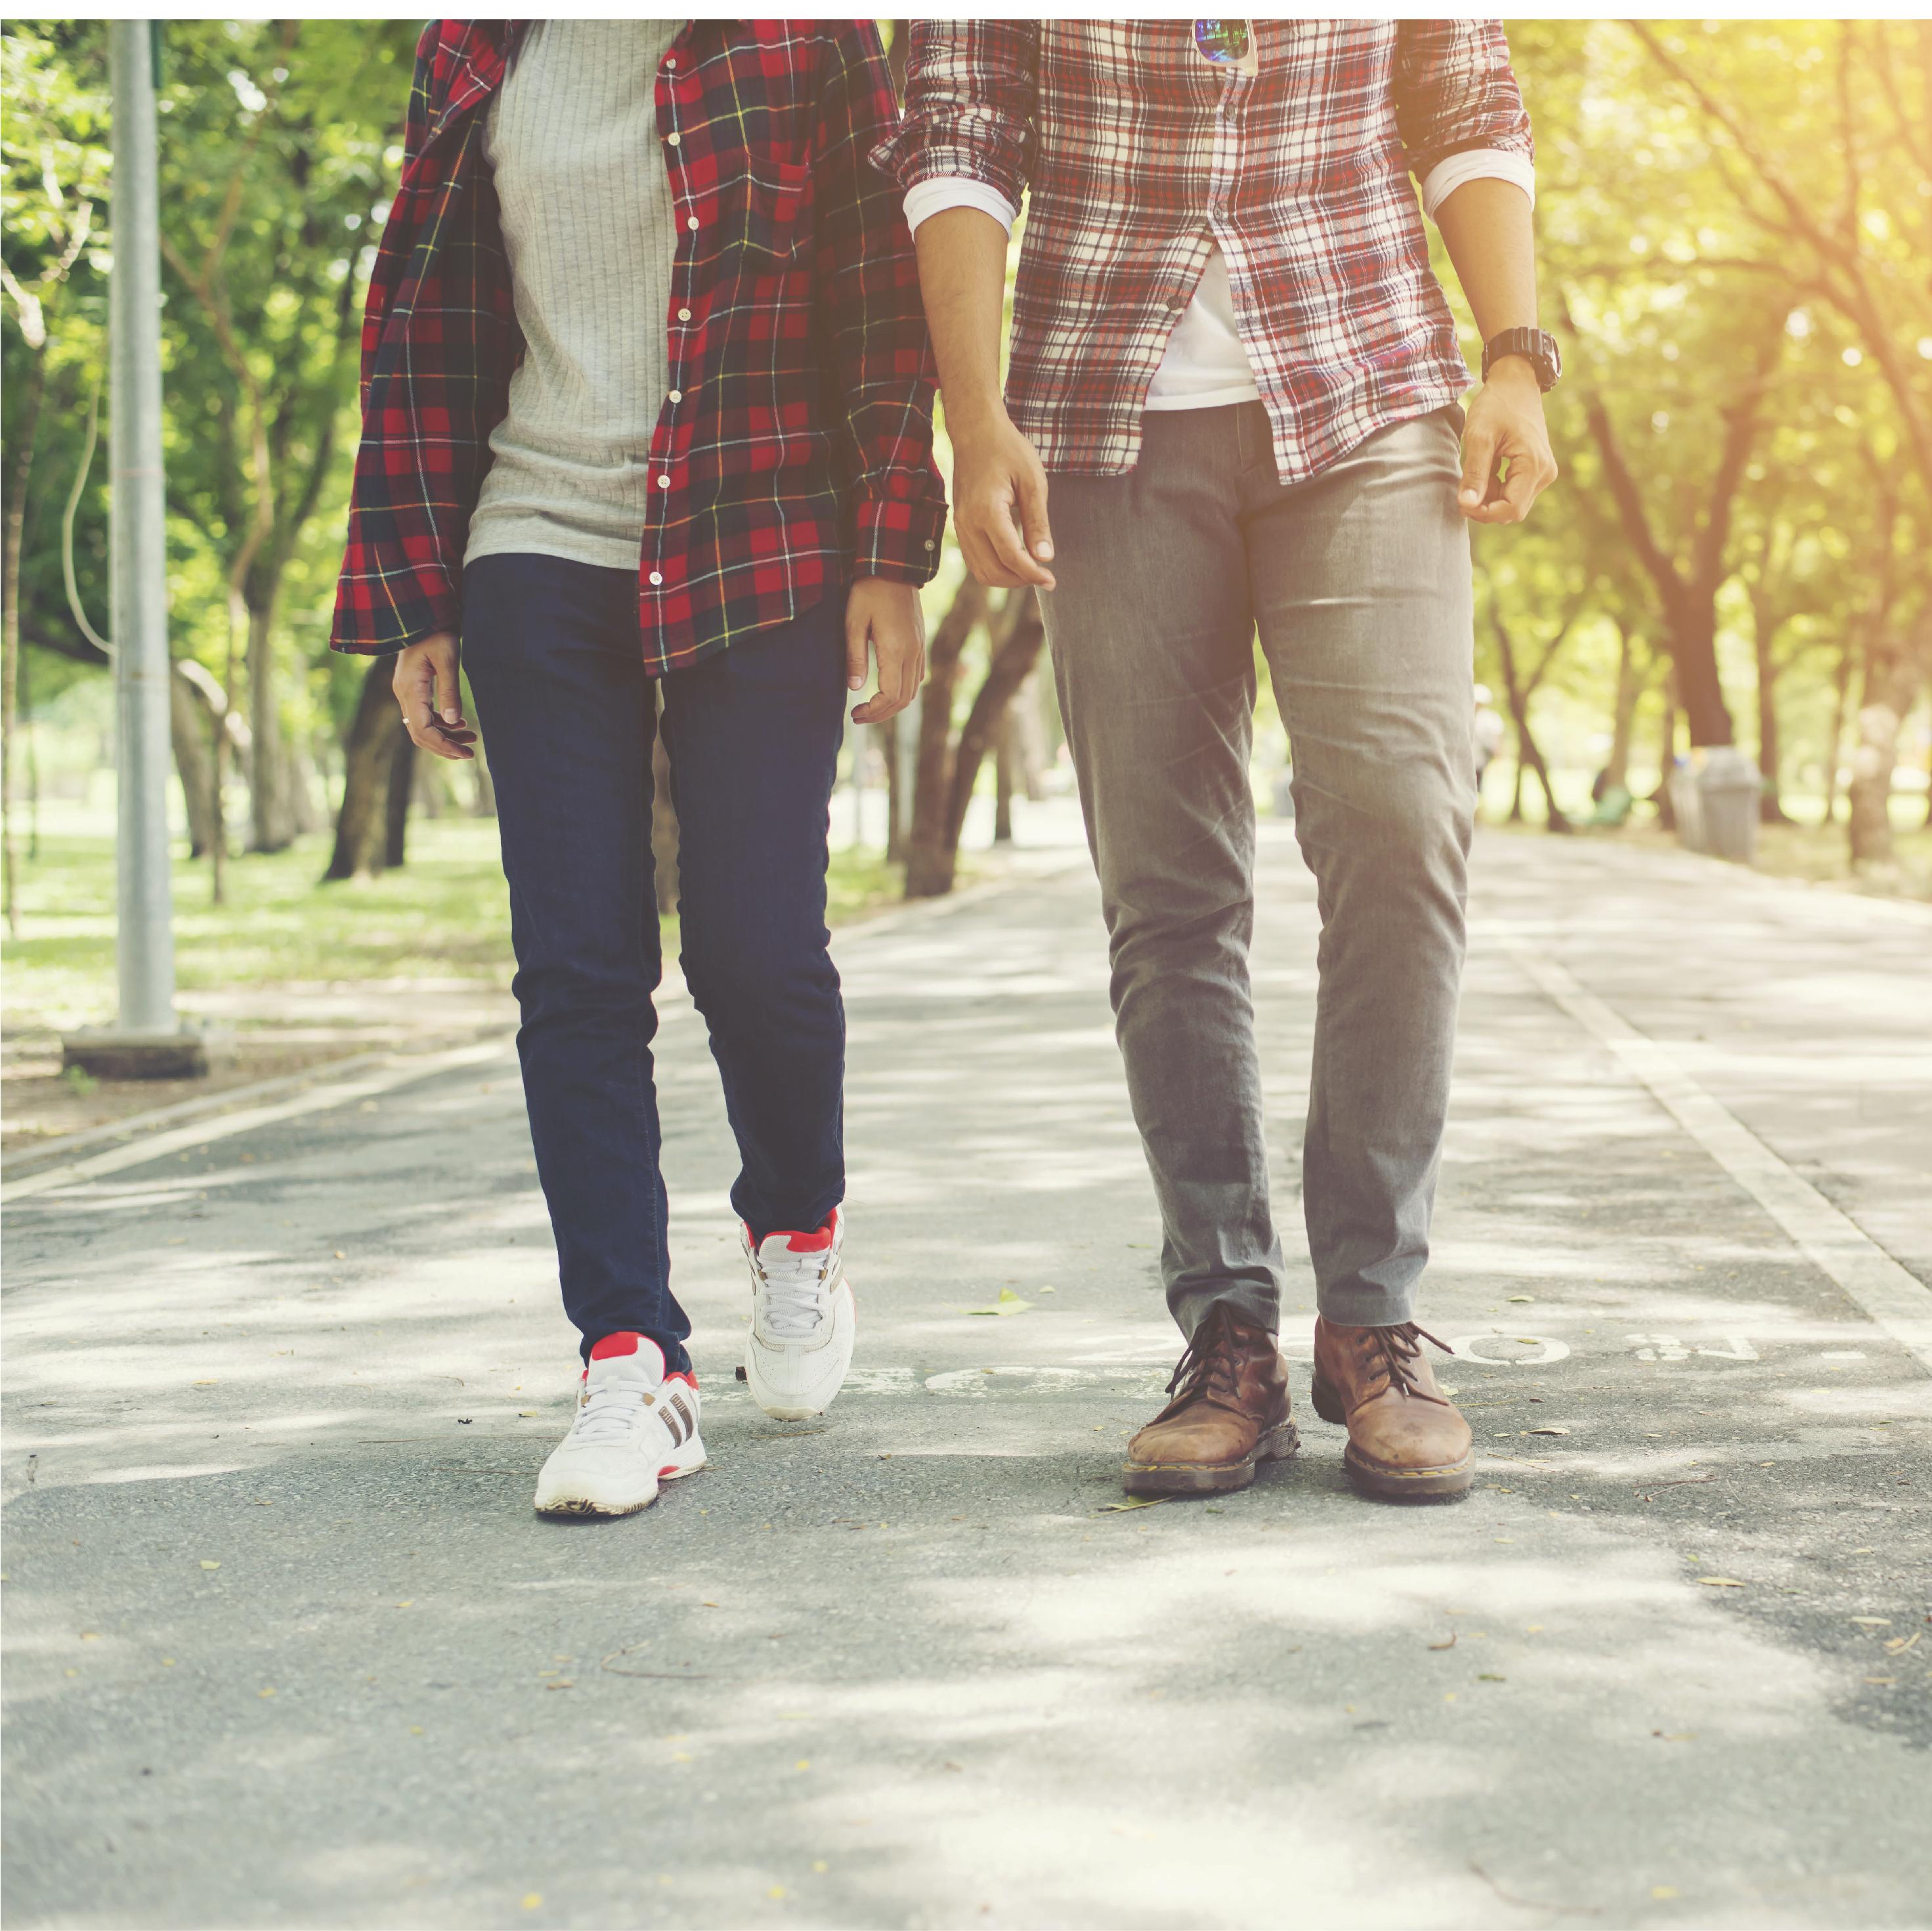 Me resulta dificil encontrar pareja [PUNIQRANDLINE-(au-dating-names.txt) 28